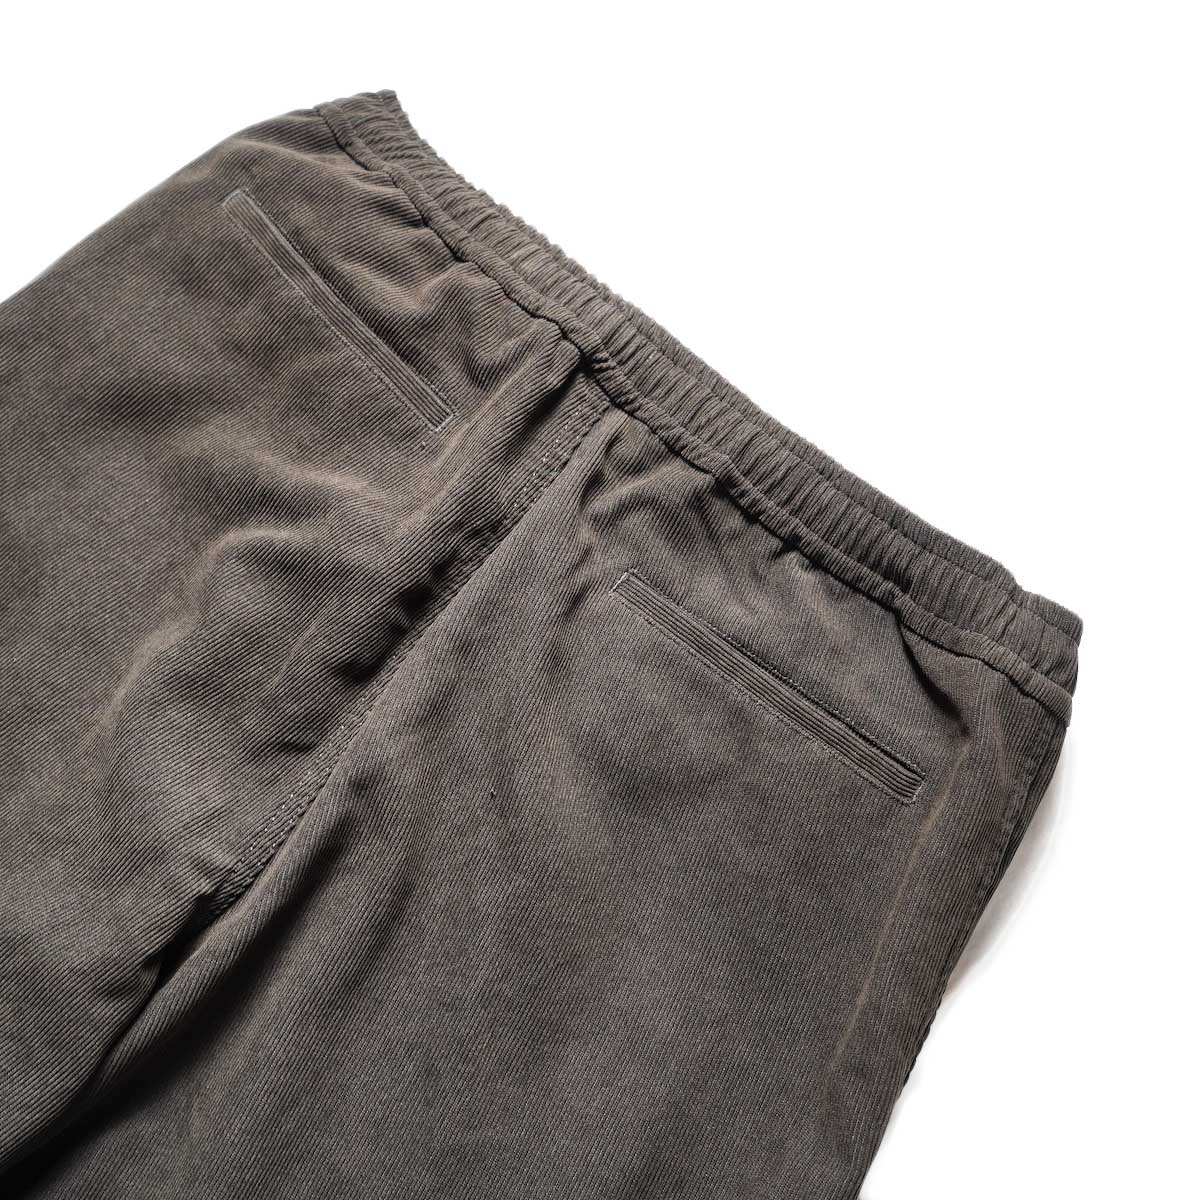 DAIWA PIER39 / TECH CORDUROY EASY TROUSERS (Brown)ヒップポケット